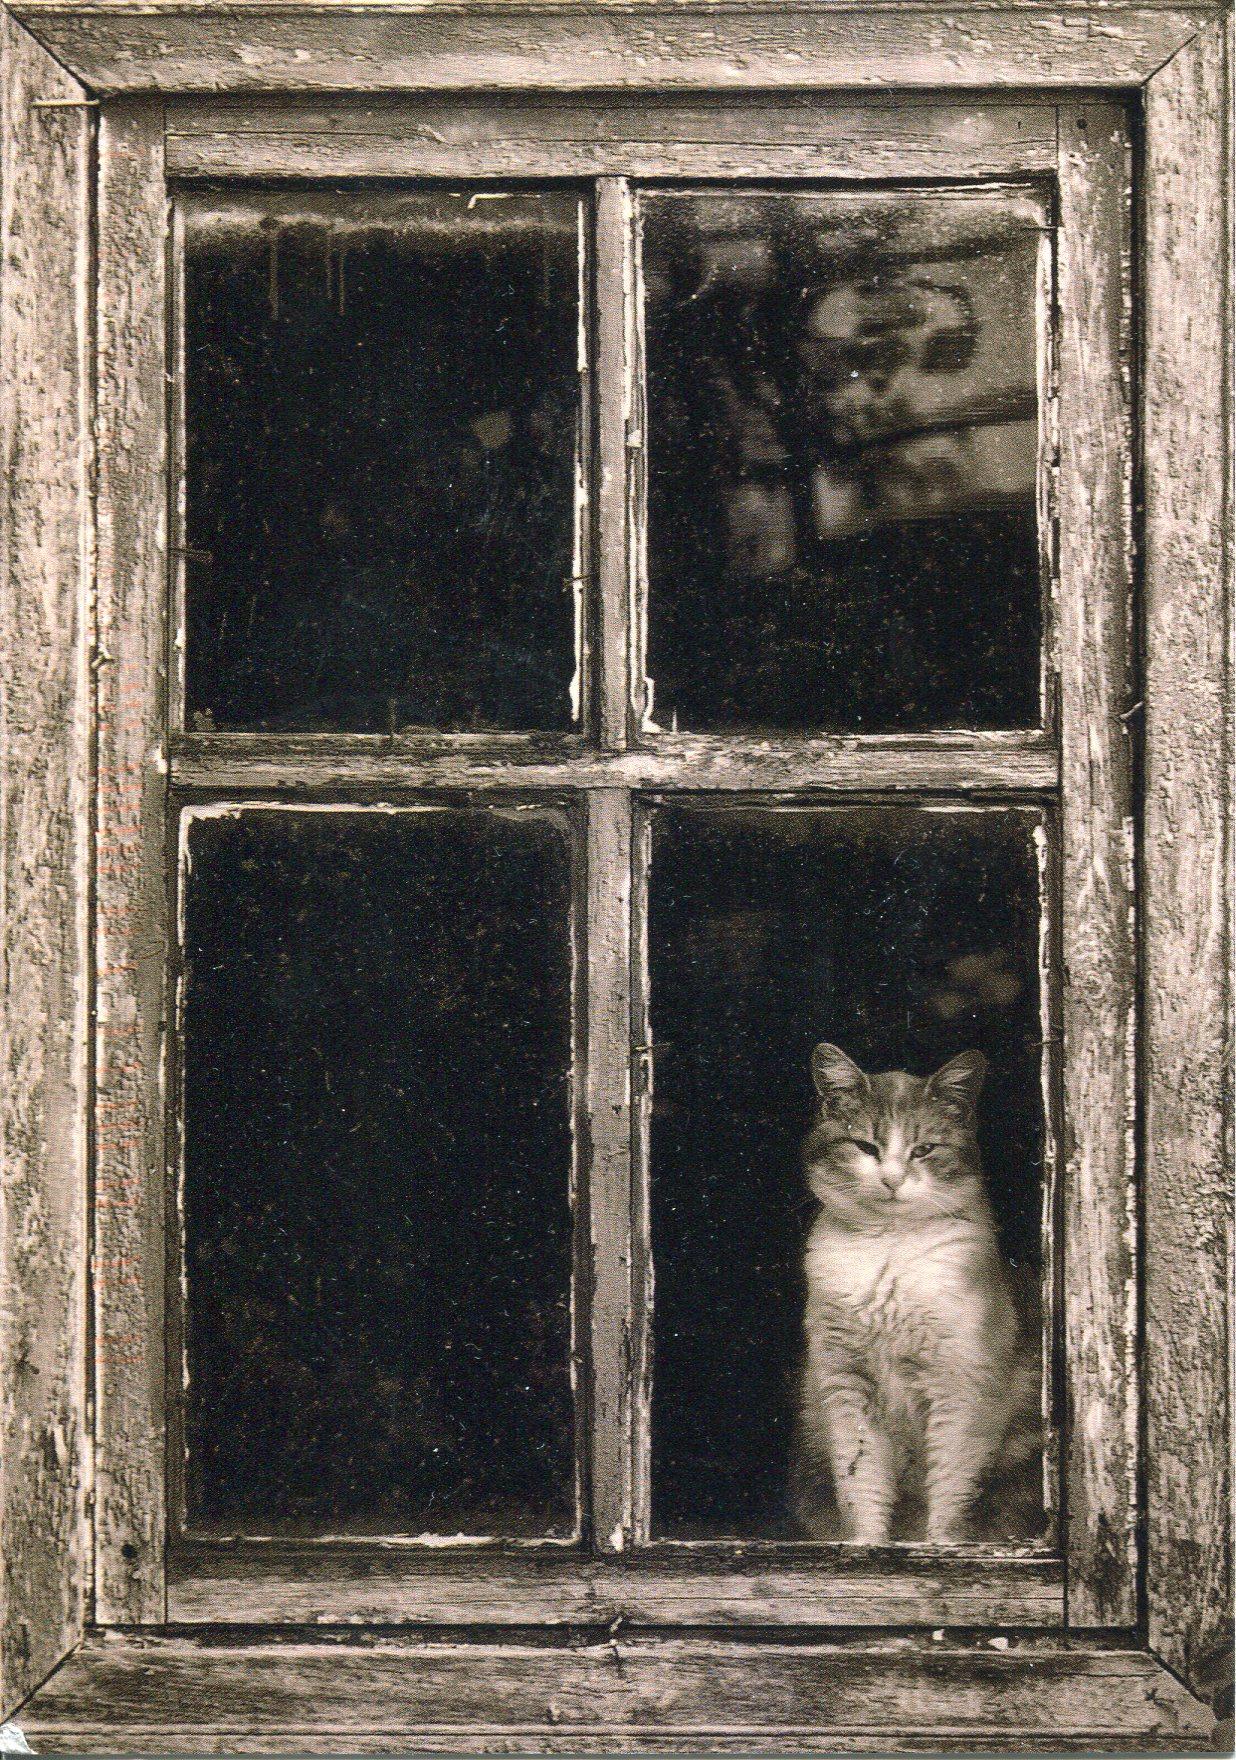 Cat in the window photo